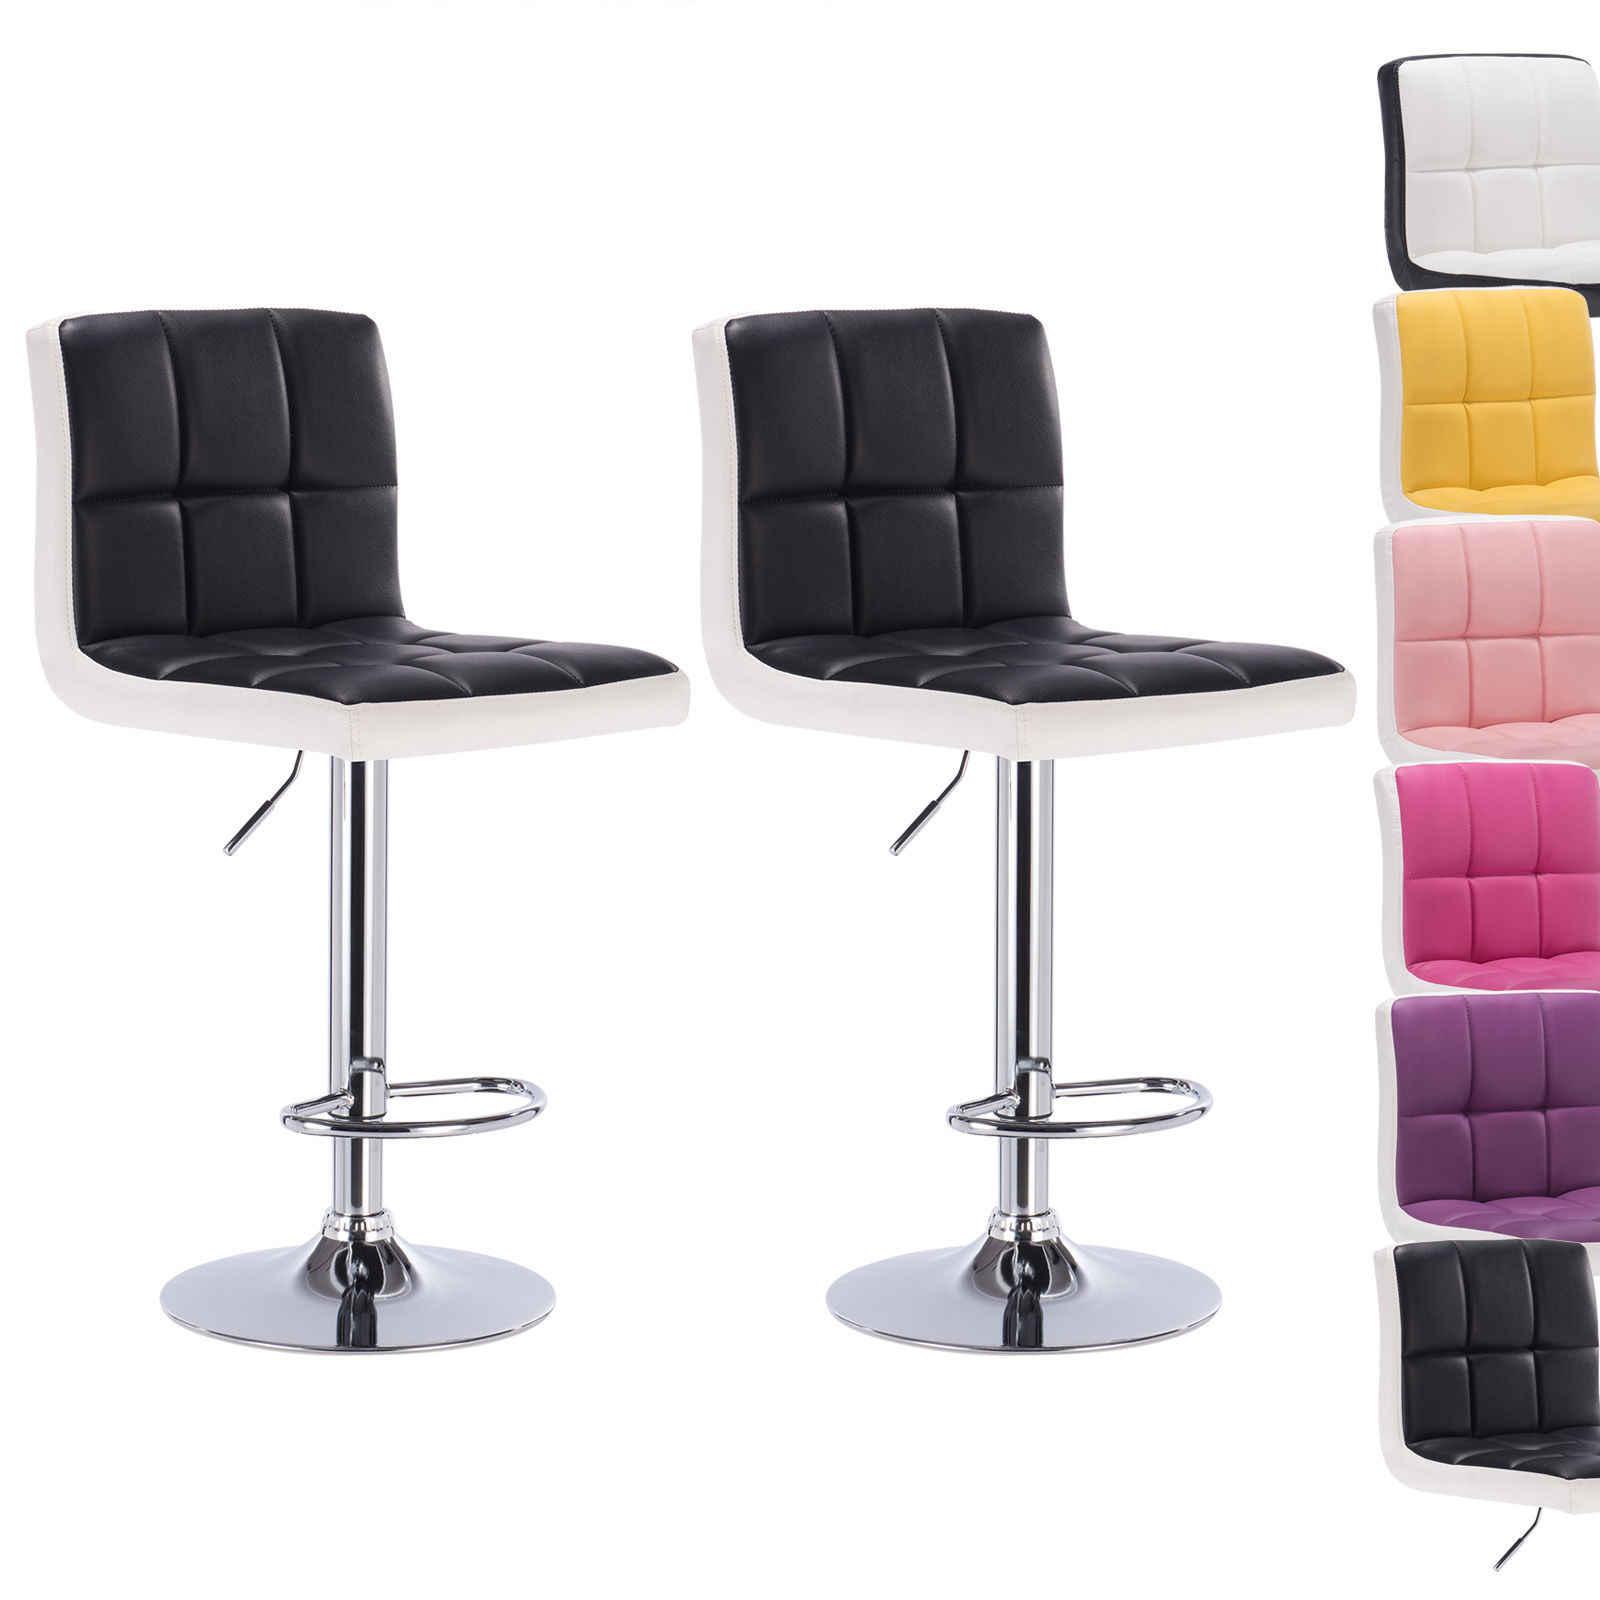 2pcs Set Modern Bar Stools Black White Pu Leather Bar Chair Height Adjustable Lift Stool Bar Chaise De Bar Furniture Hwc Bar Chairs Aliexpress